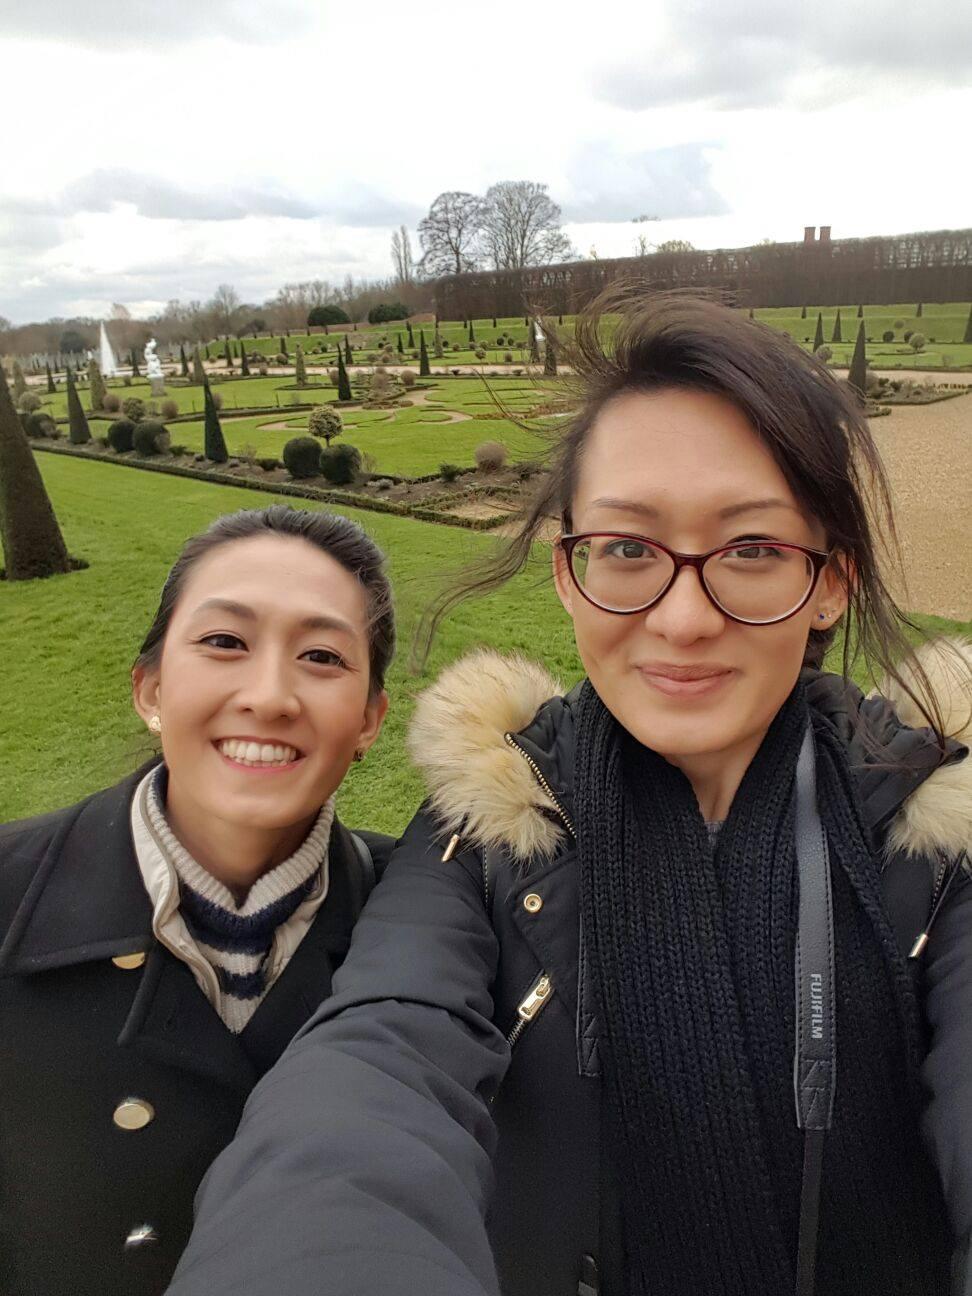 Superpeach blog Hampton Court garden selfie